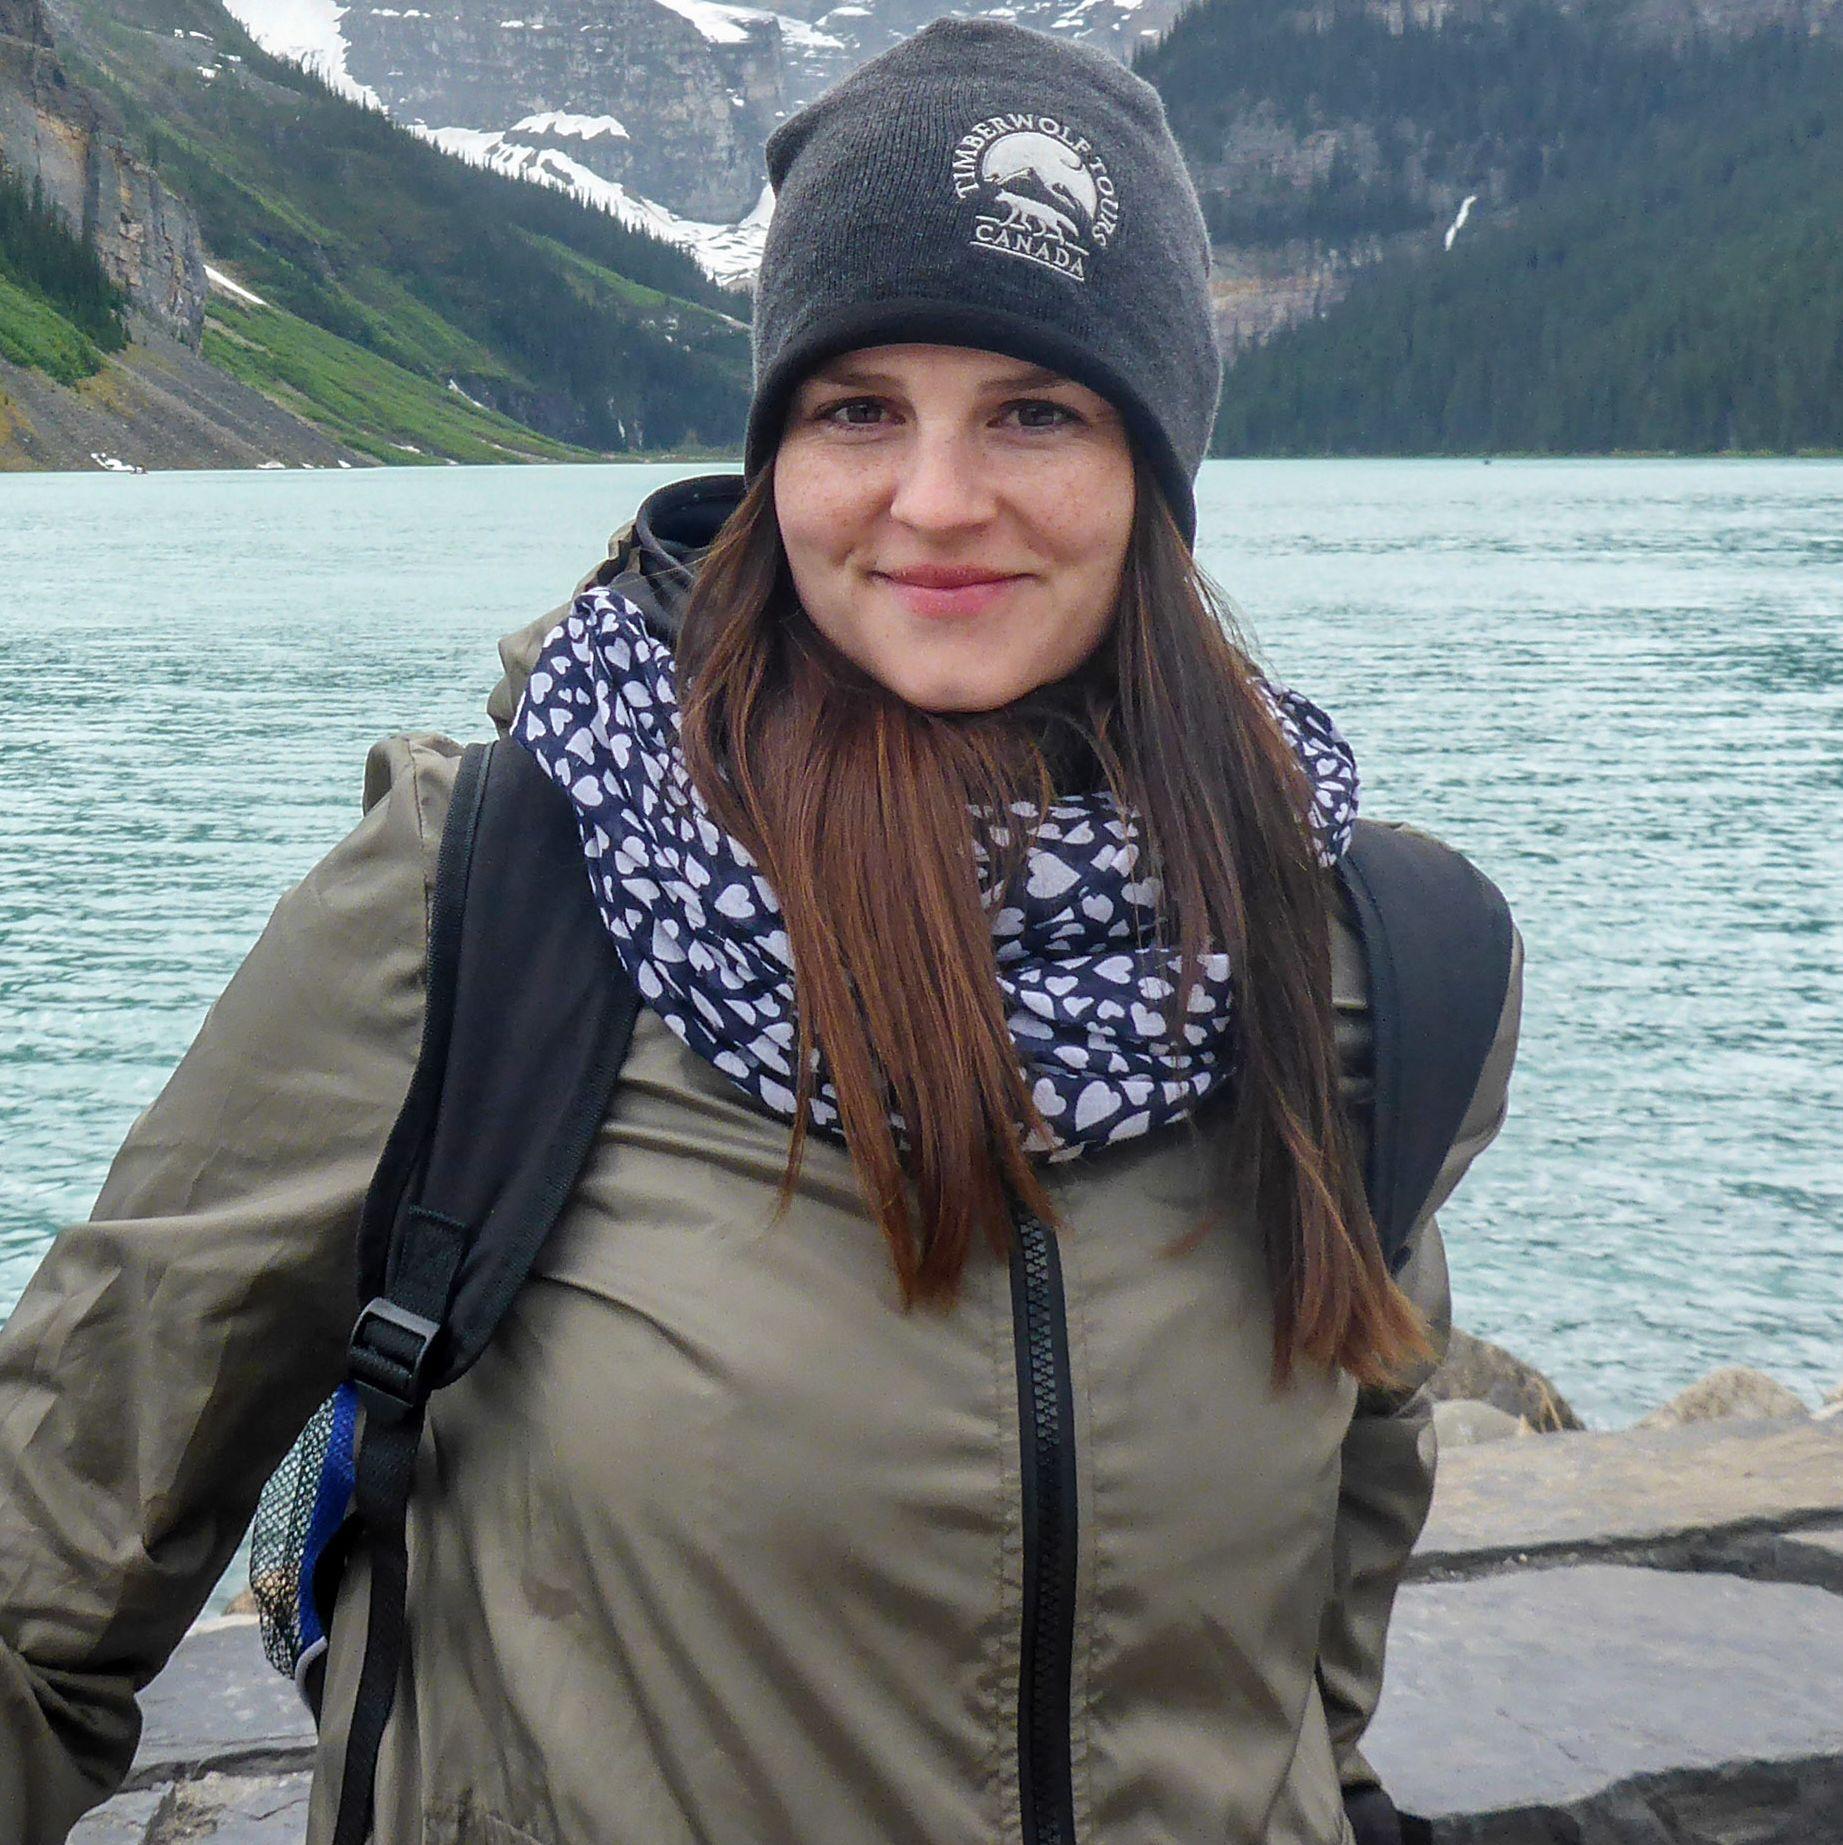 Maja Sebode vor dem Lake Louise in Banff